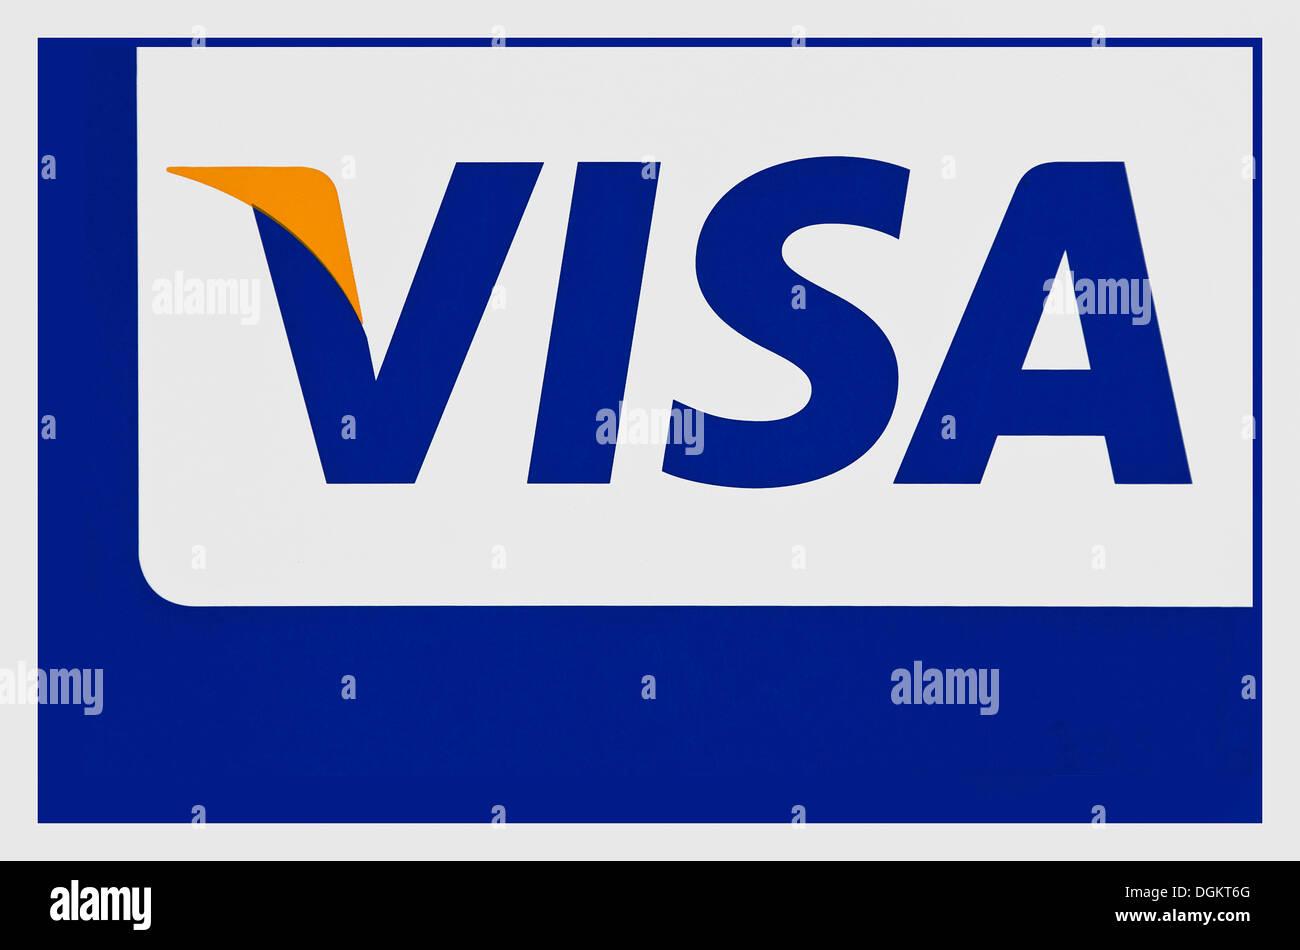 Visa logo, Visa International Service Association, credit card organisation - Stock Image